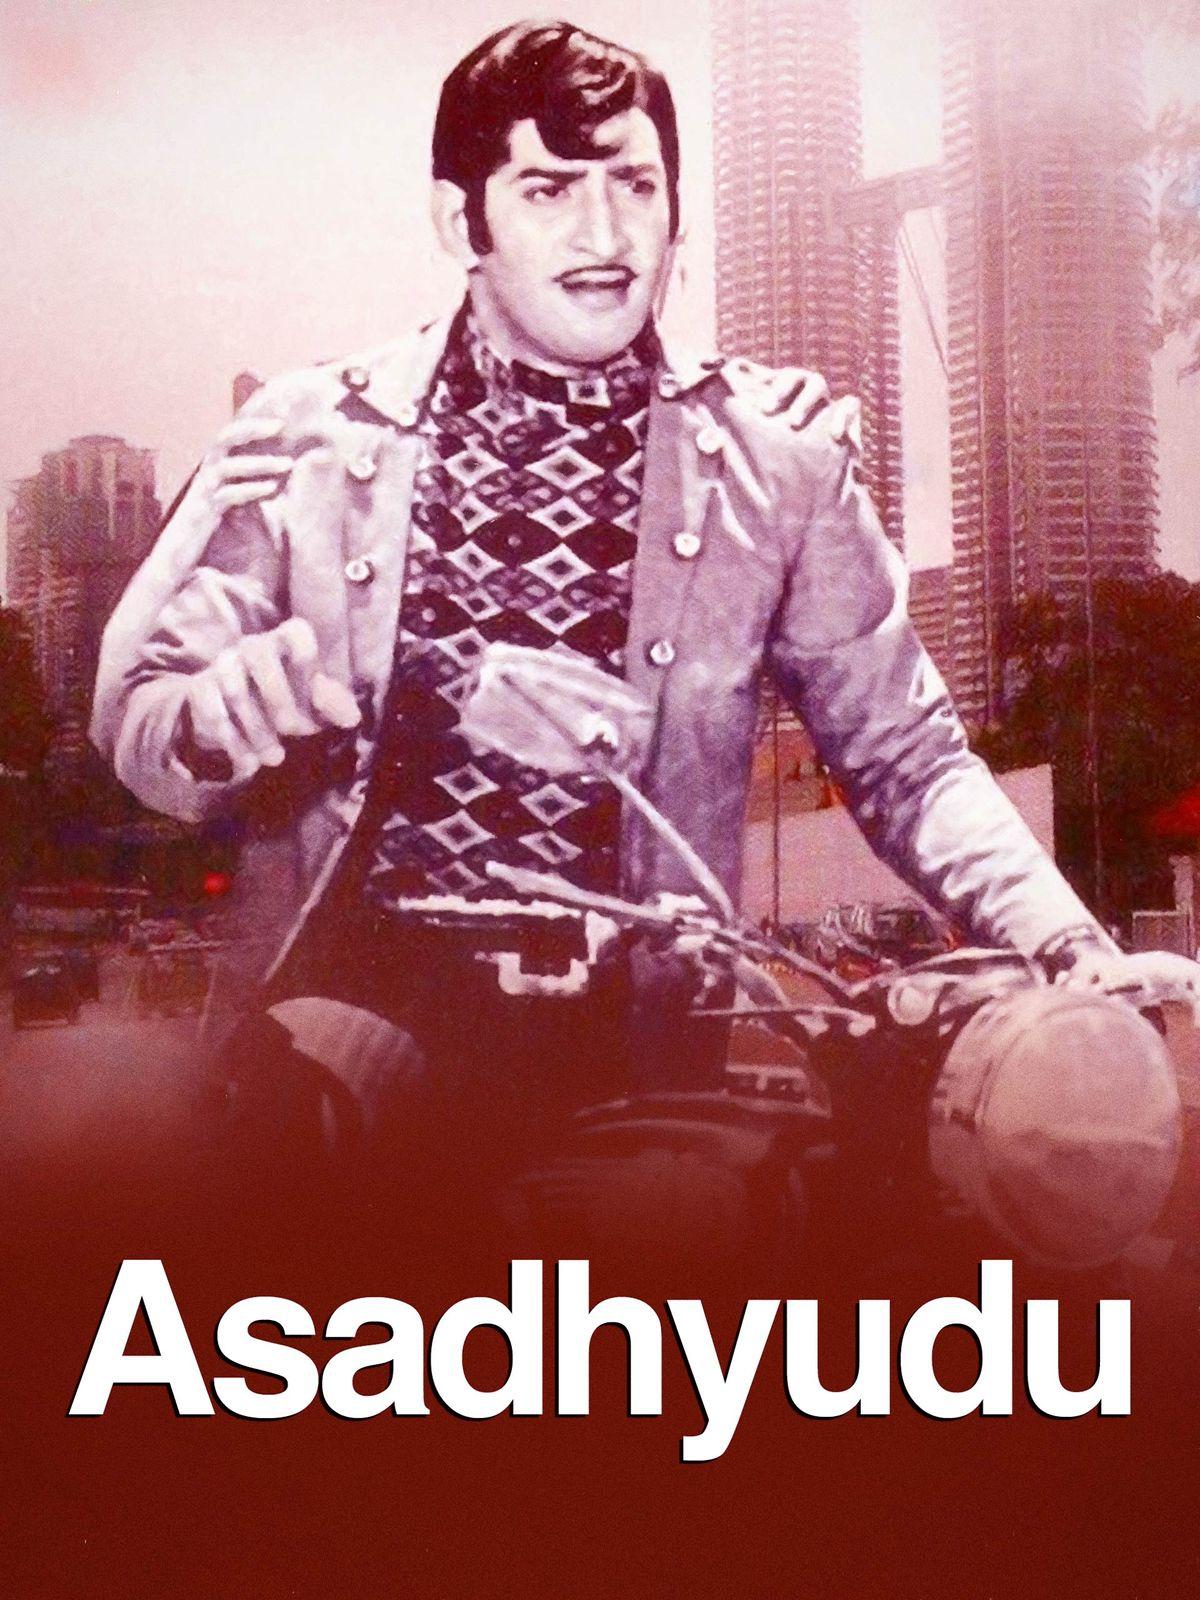 Asadhyudu